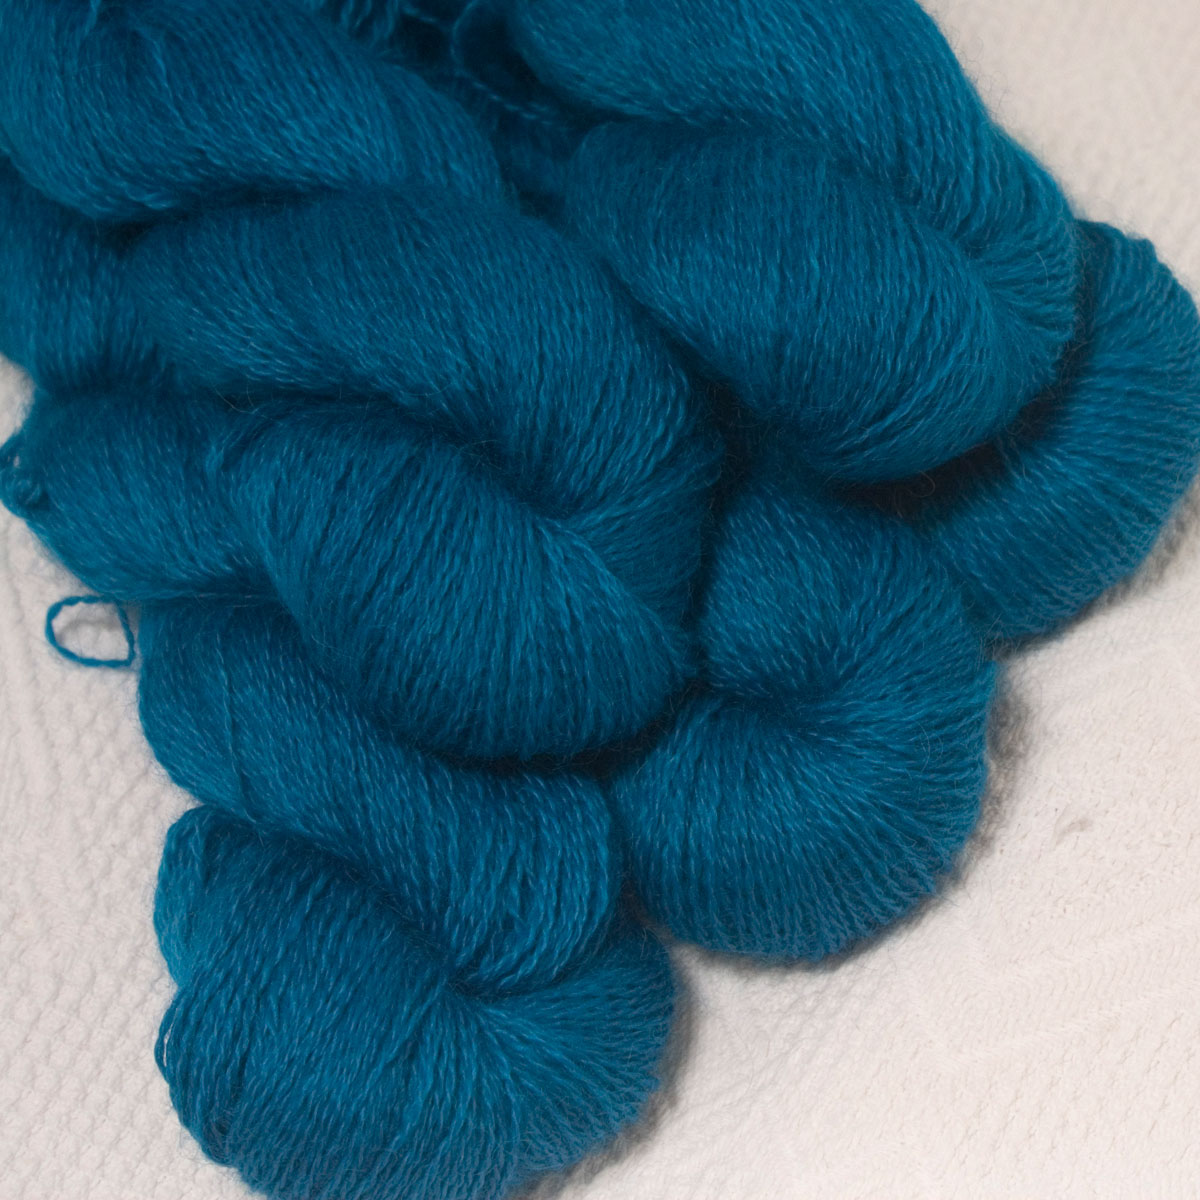 25g number 4 Royal blue hand dyed Wensleydale locks